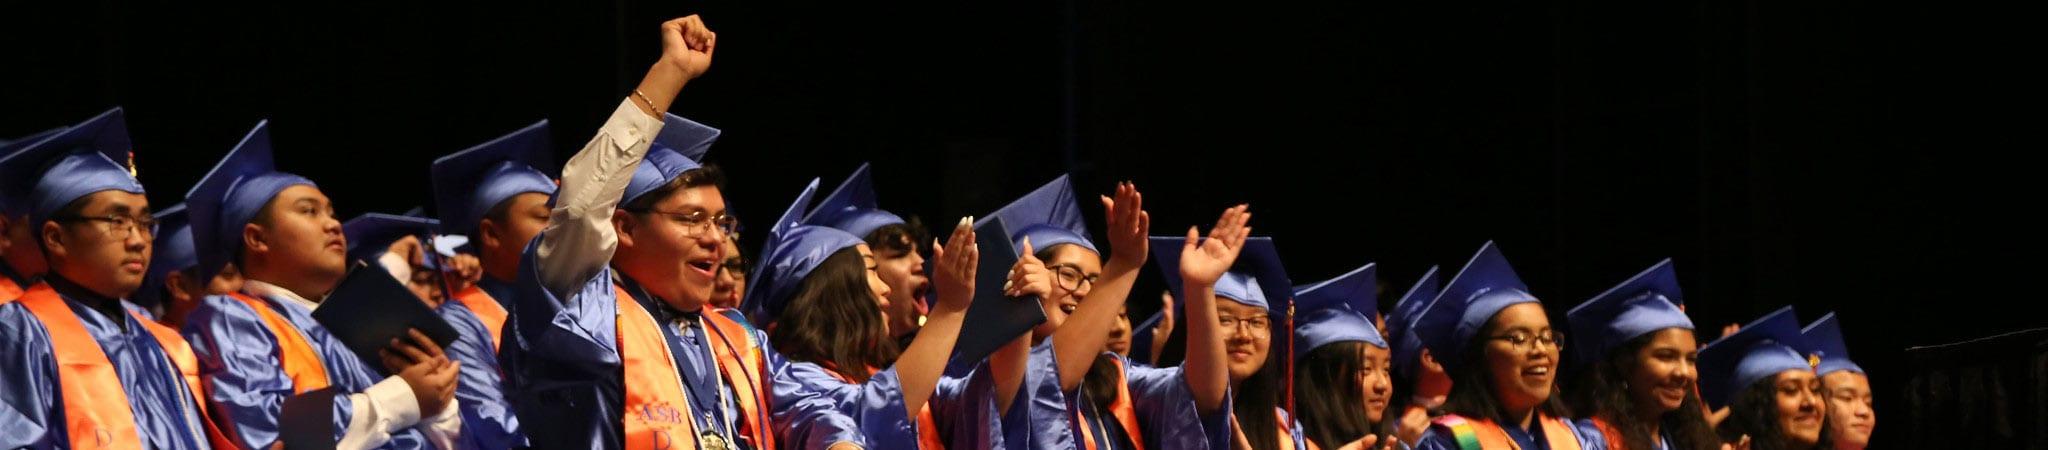 2019 Duncan graduates